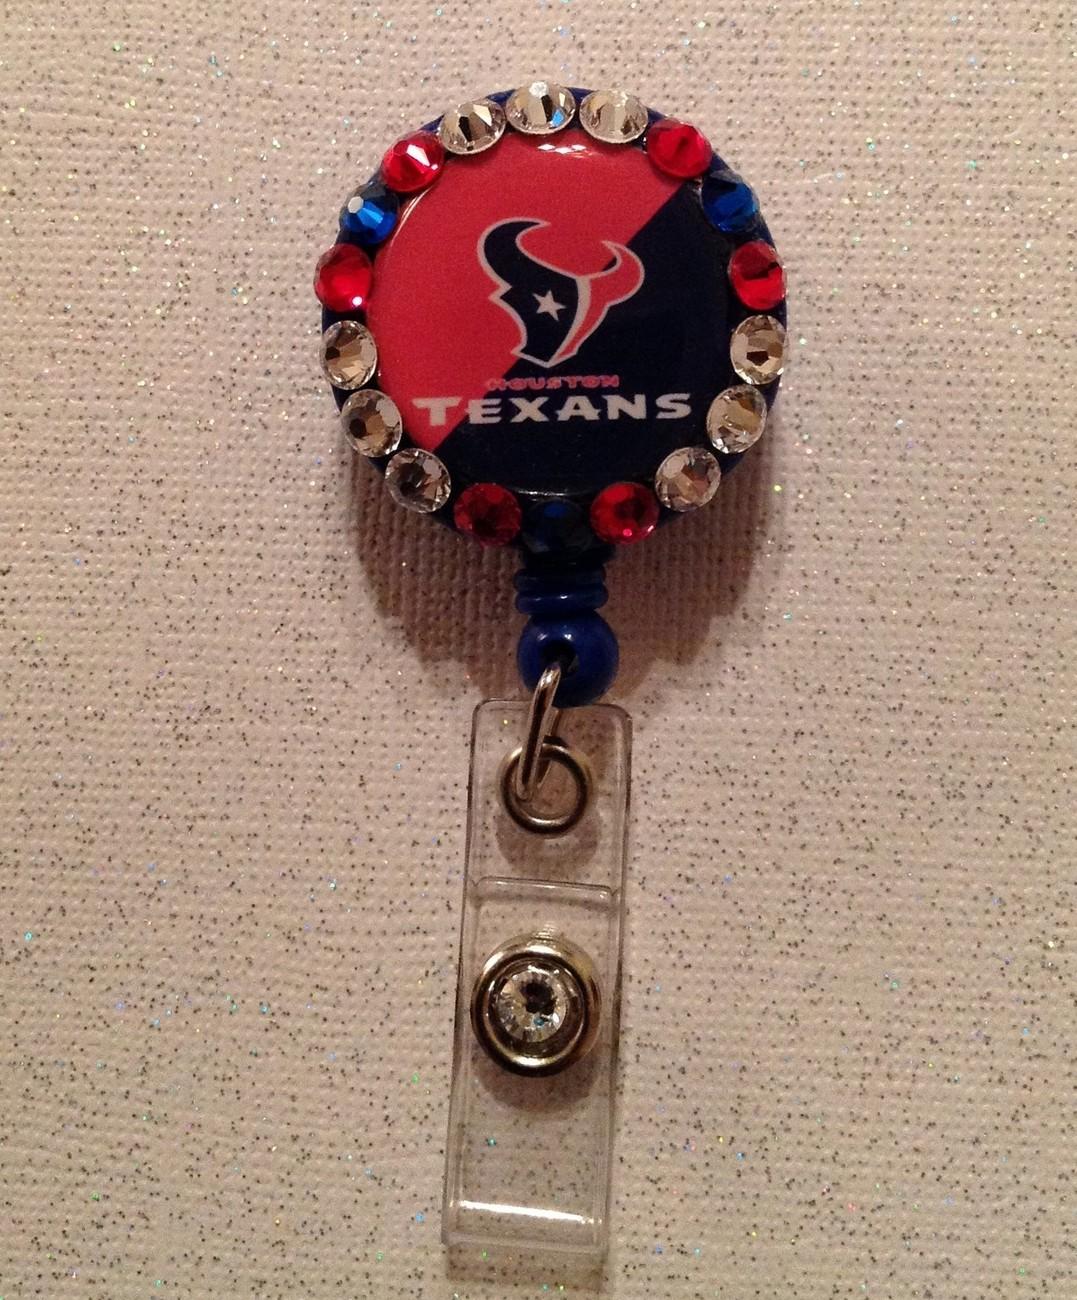 Nfl Houston Texans Badge Reel - Texans Badge Reel -  Texans Id Holder Alligator